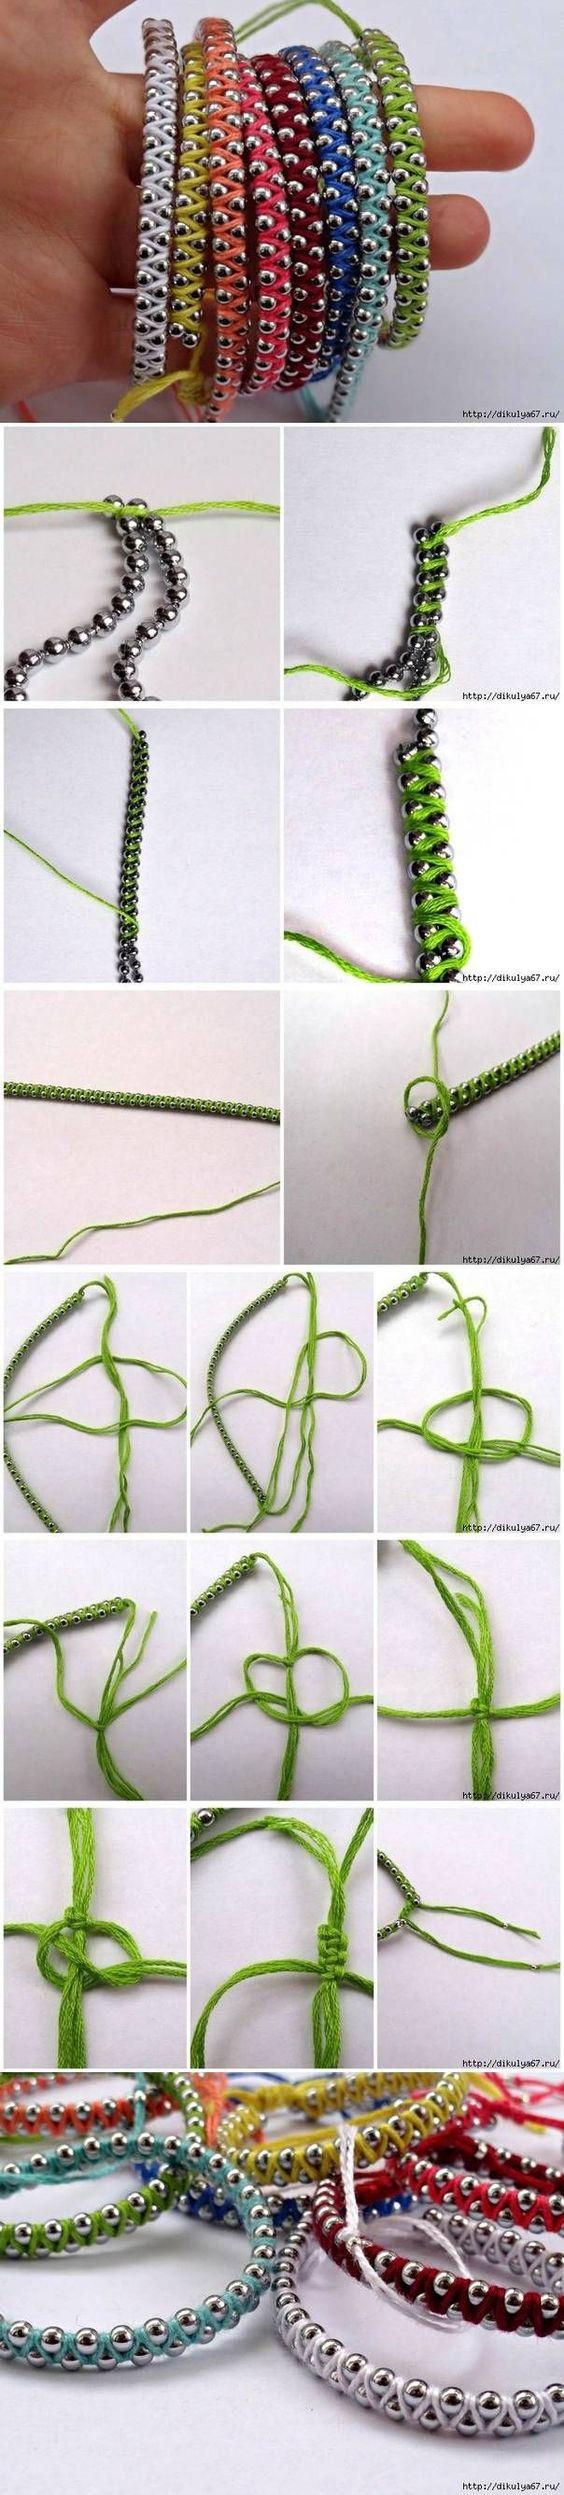 DIY Rainbow Friendship Bracelets DIY Projects   UsefulDIY.com: